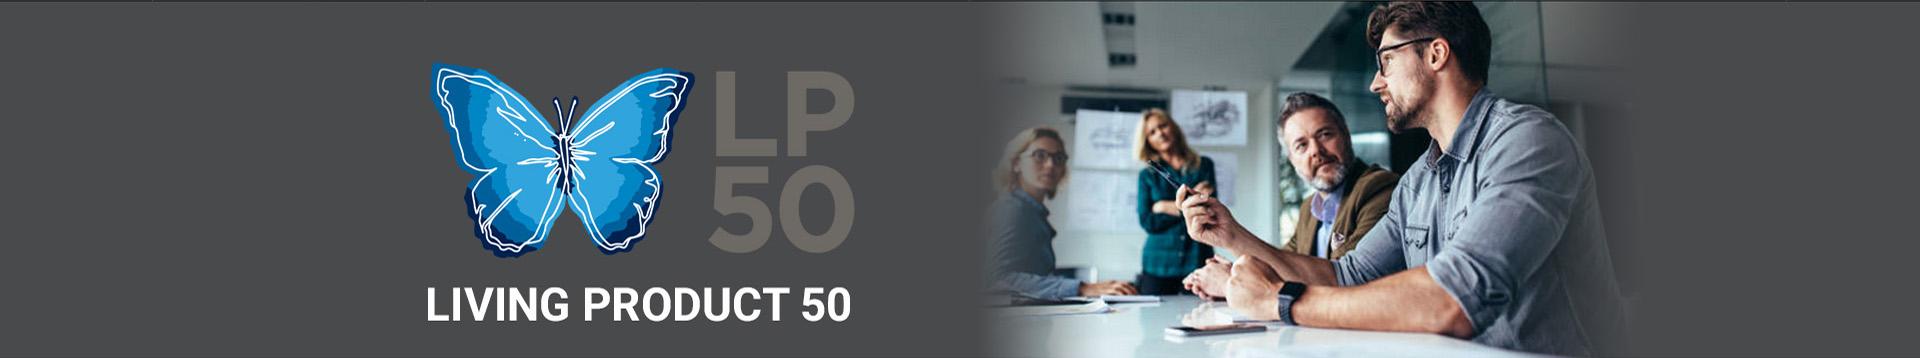 LP-50-Web-Header-Banner